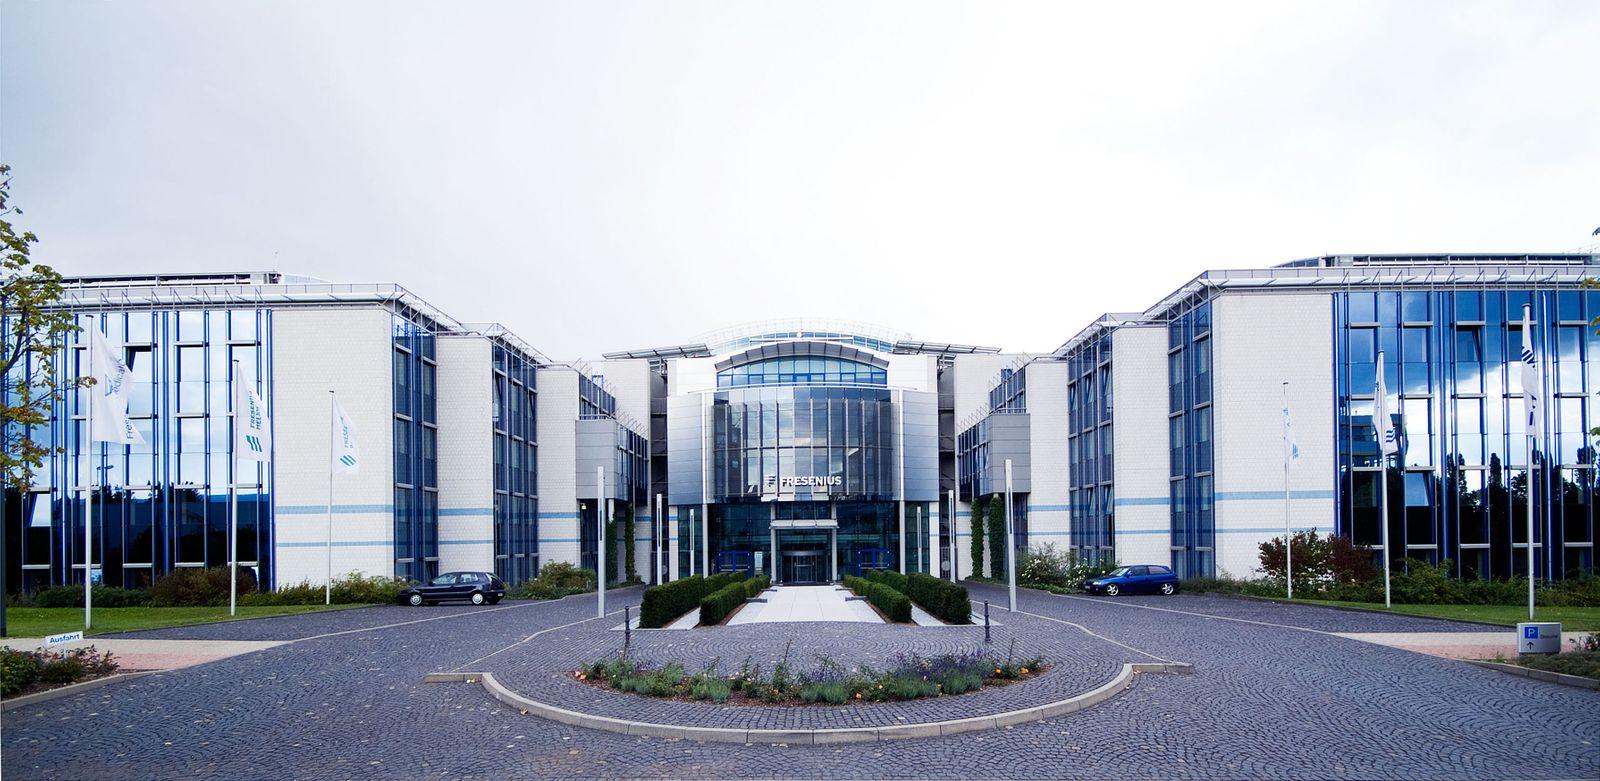 Fresenius SE & Co. KGaA Konzernzentrale Bad Homburg PR-Bild